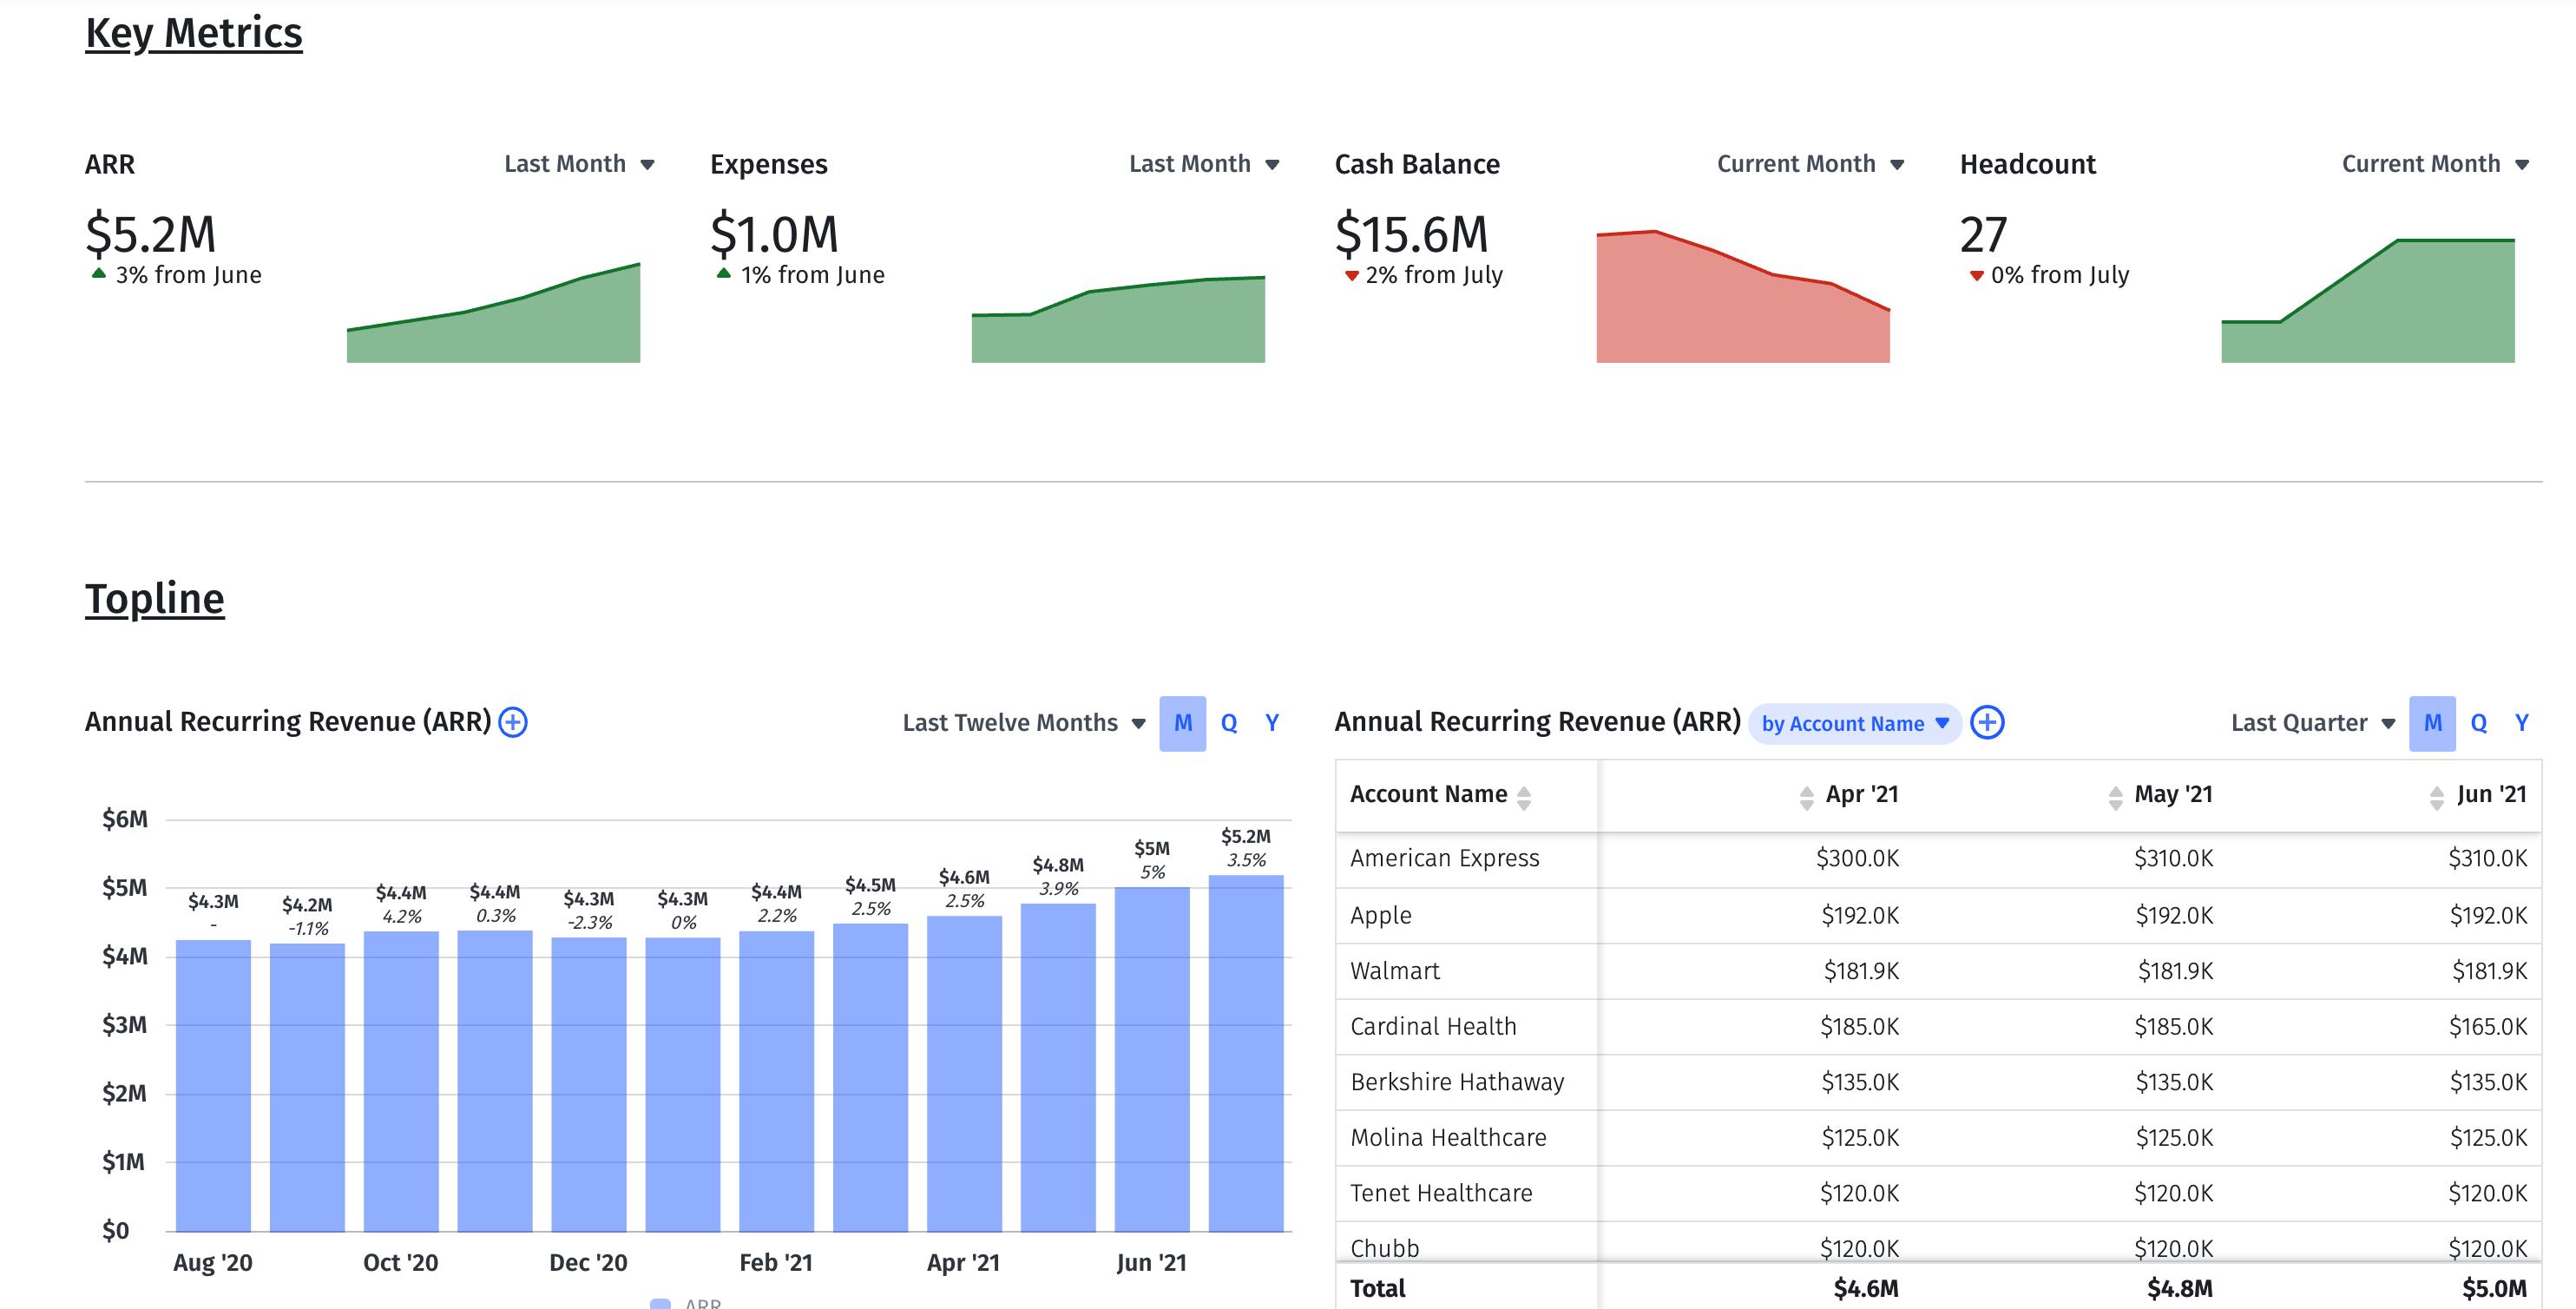 executive financial dashboard example arr expenses topline net burn headcount